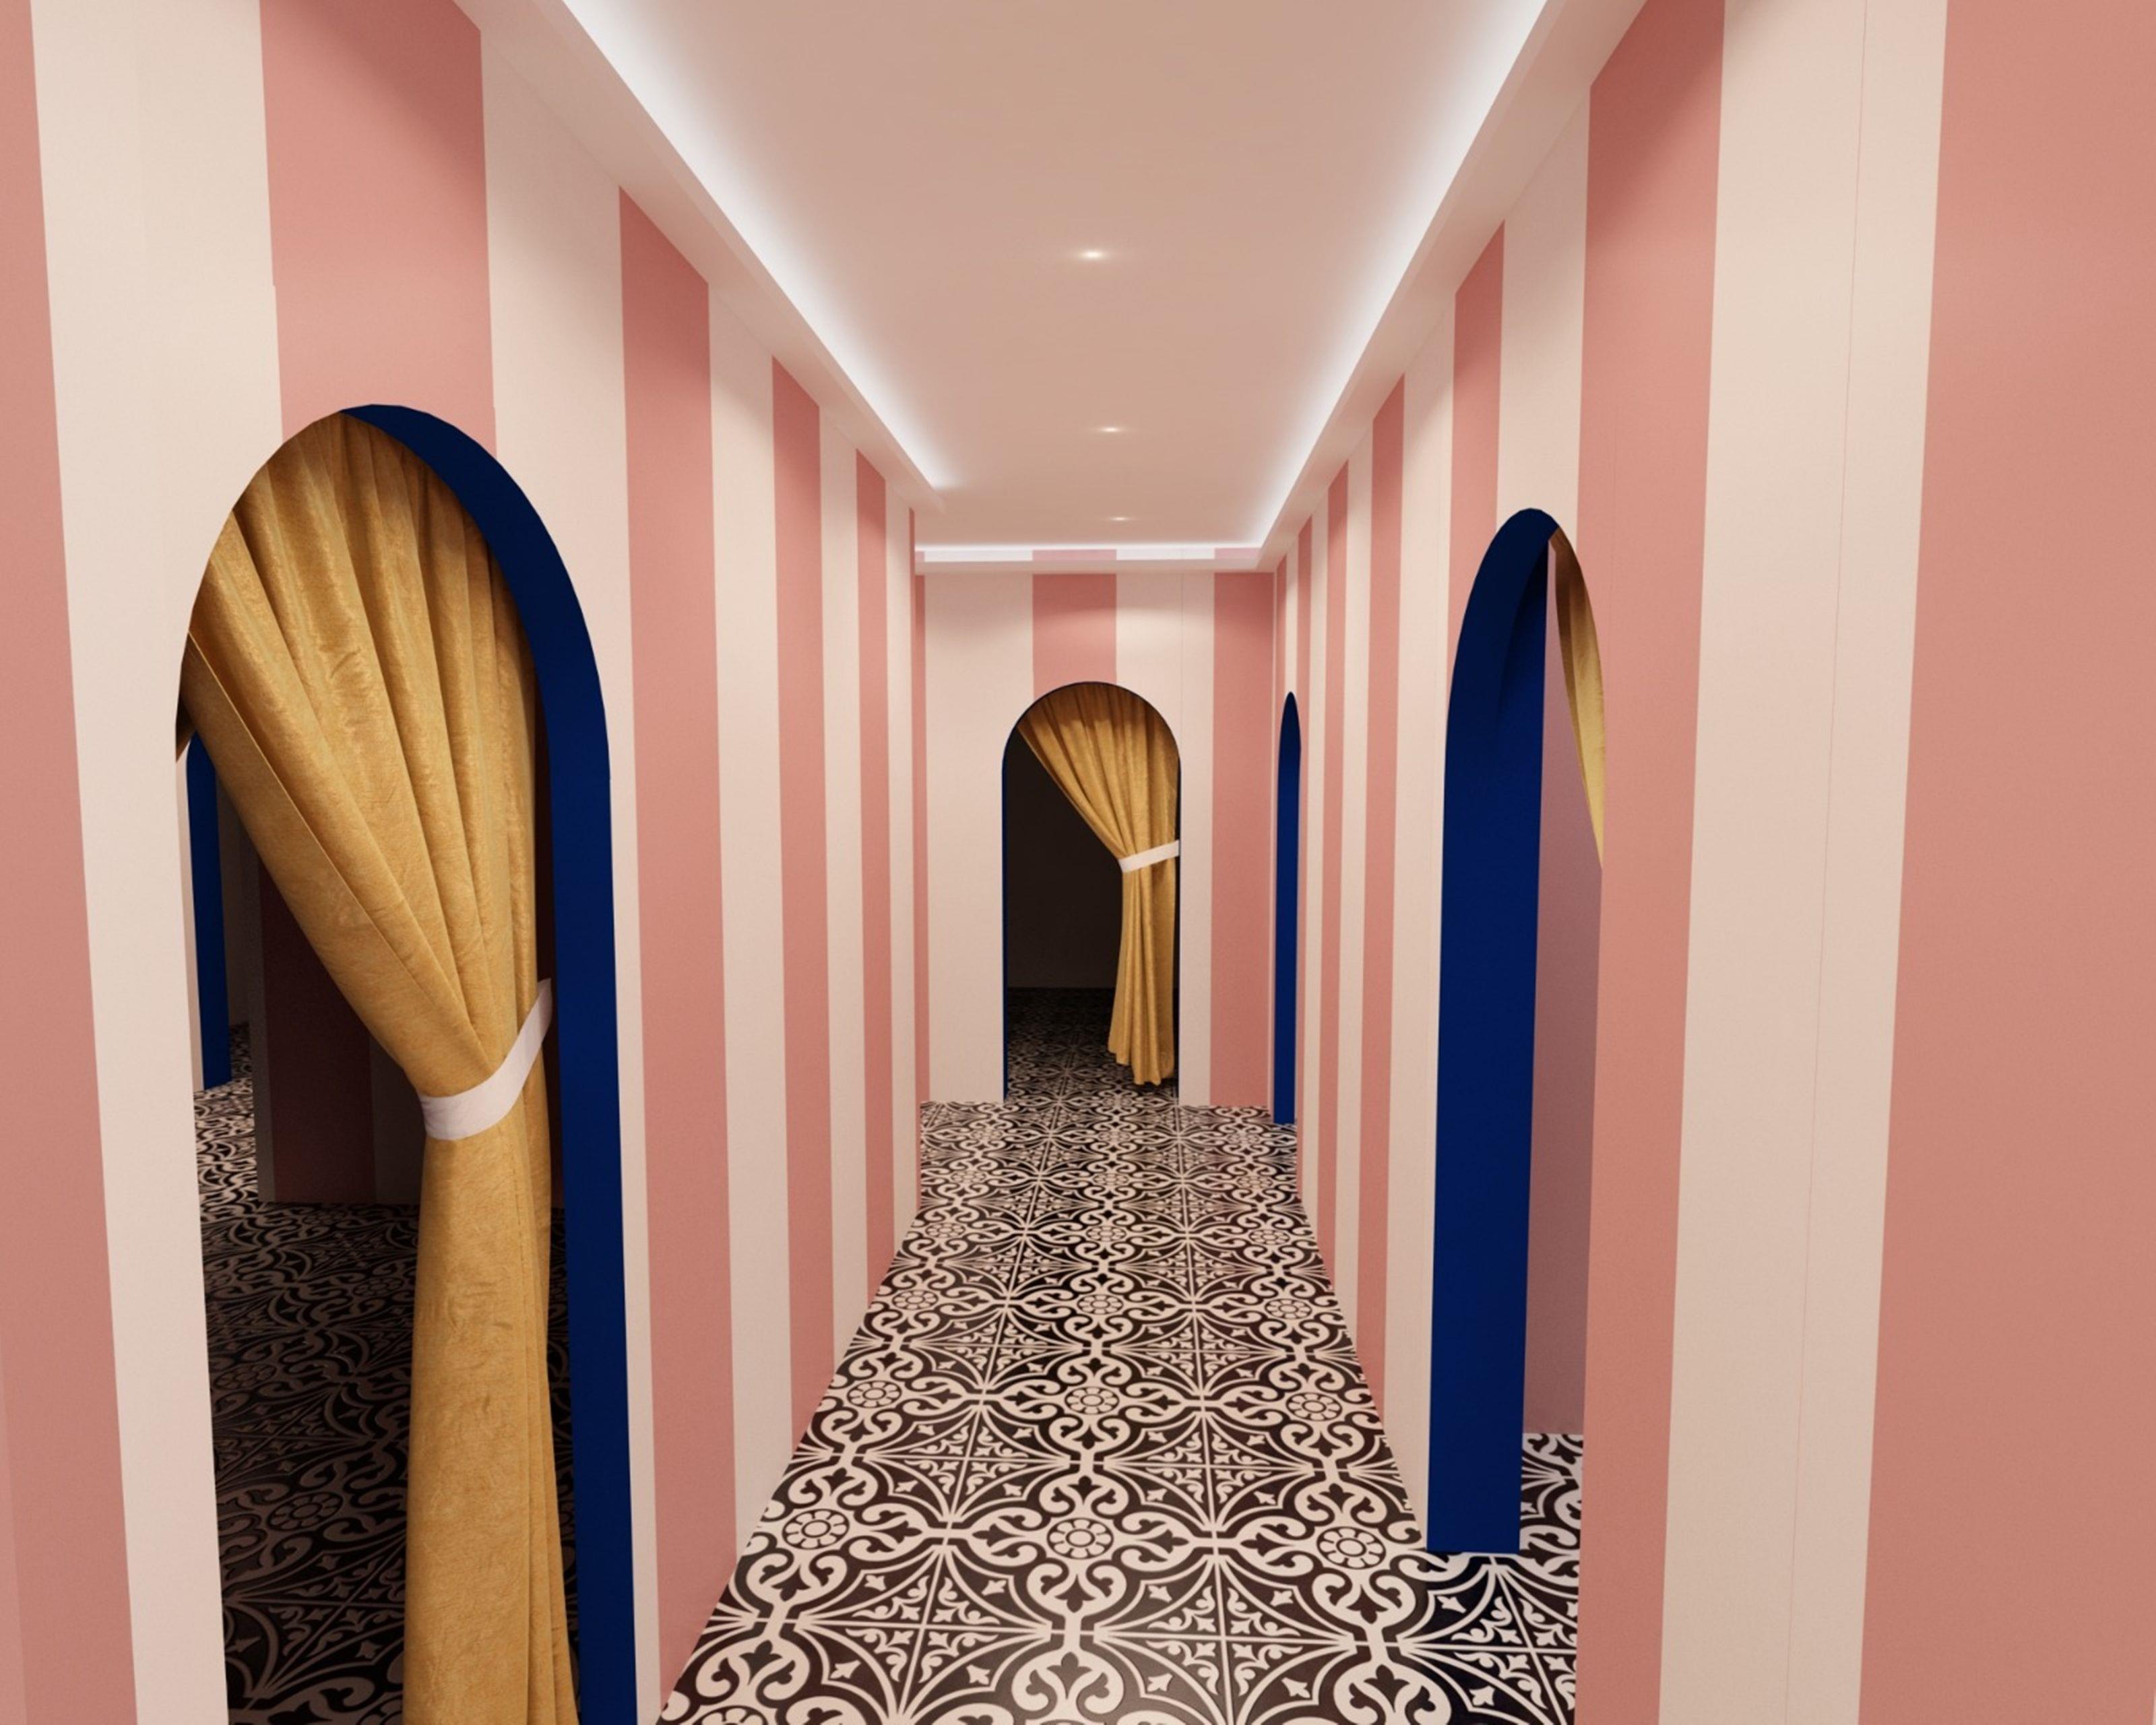 http://www.orextravel.sk/OREX/hotelphotos/anjeliq-downtown-hotel-general-0036.jpg